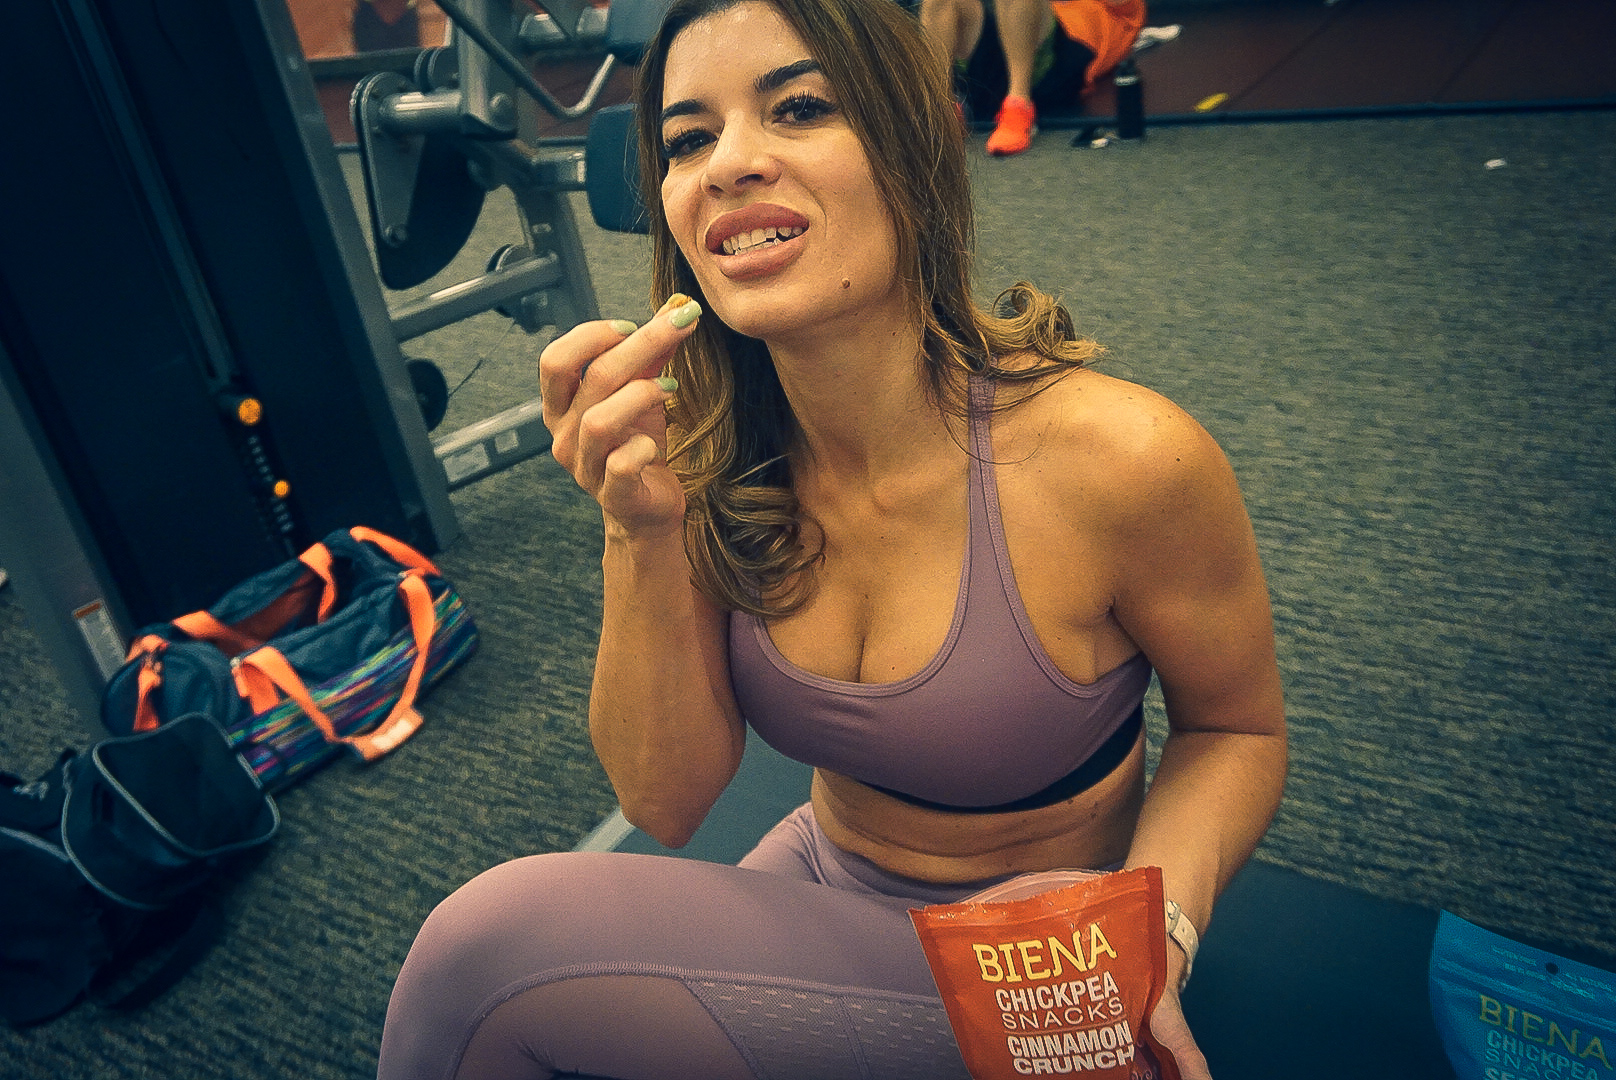 healthy snacks, biena chickpeas, nutrition